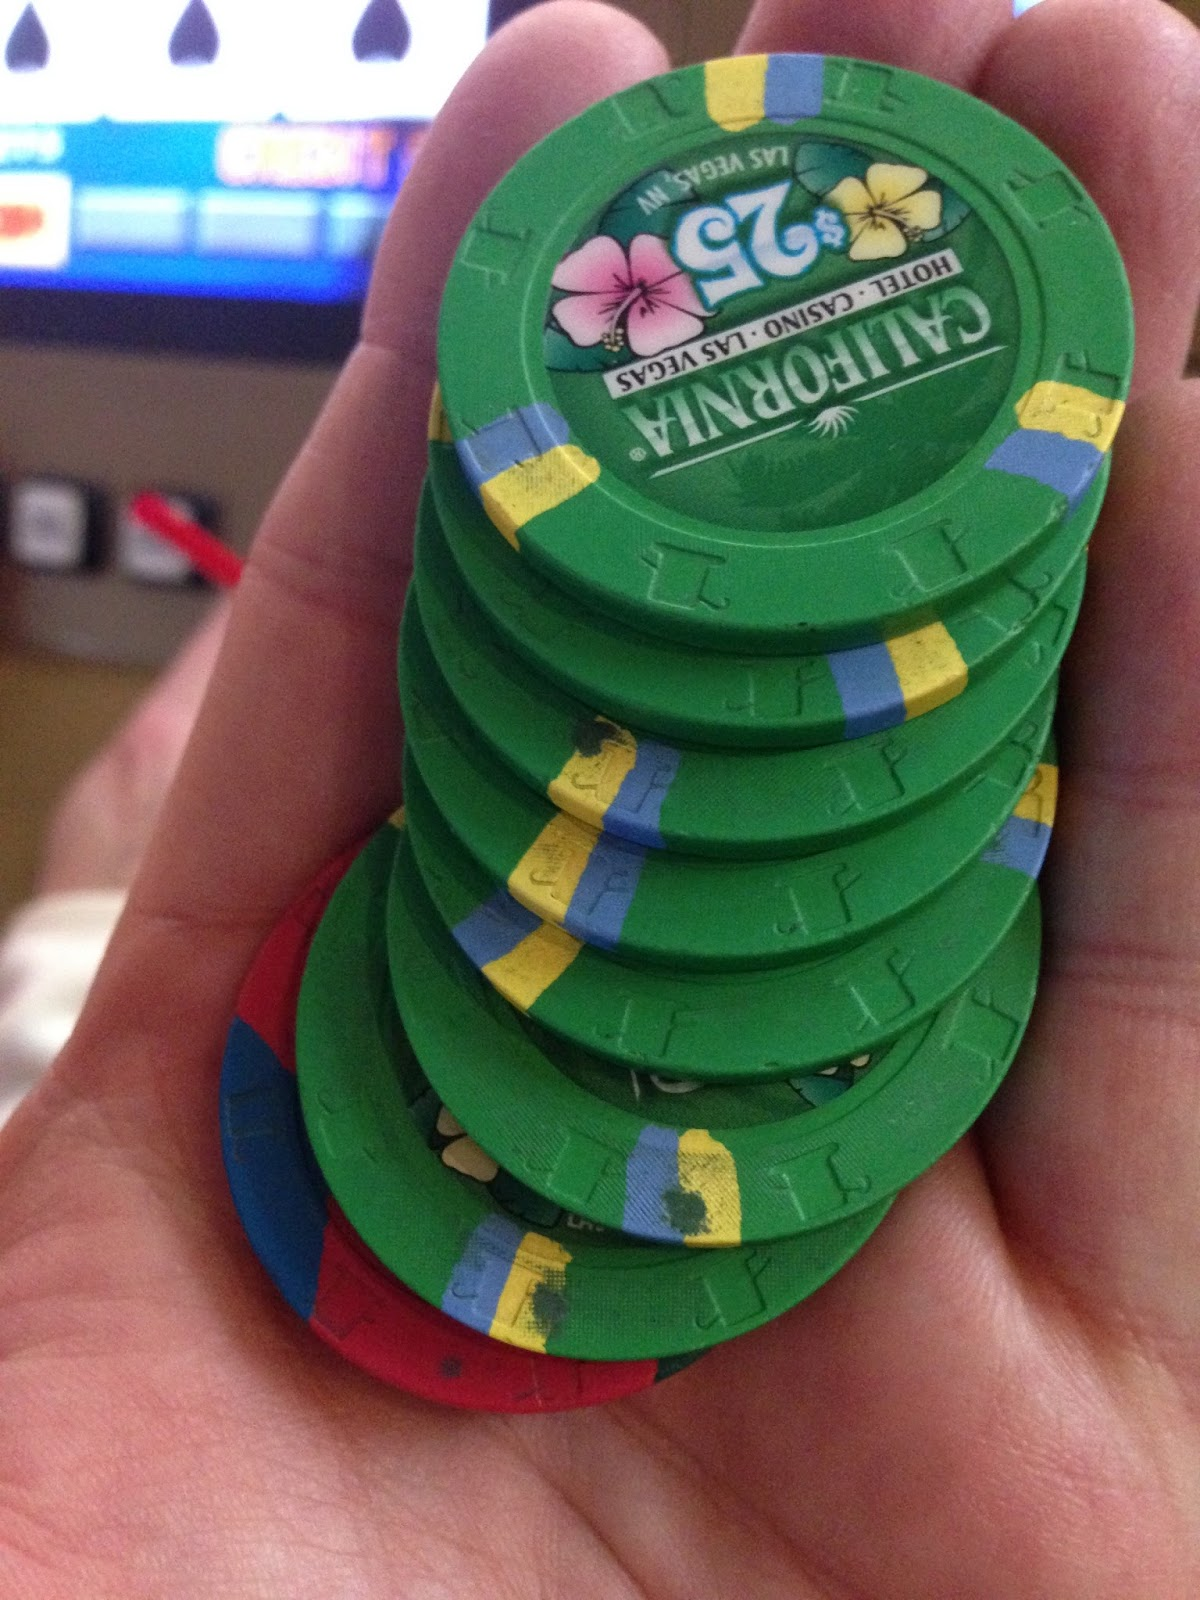 Rbc gambling